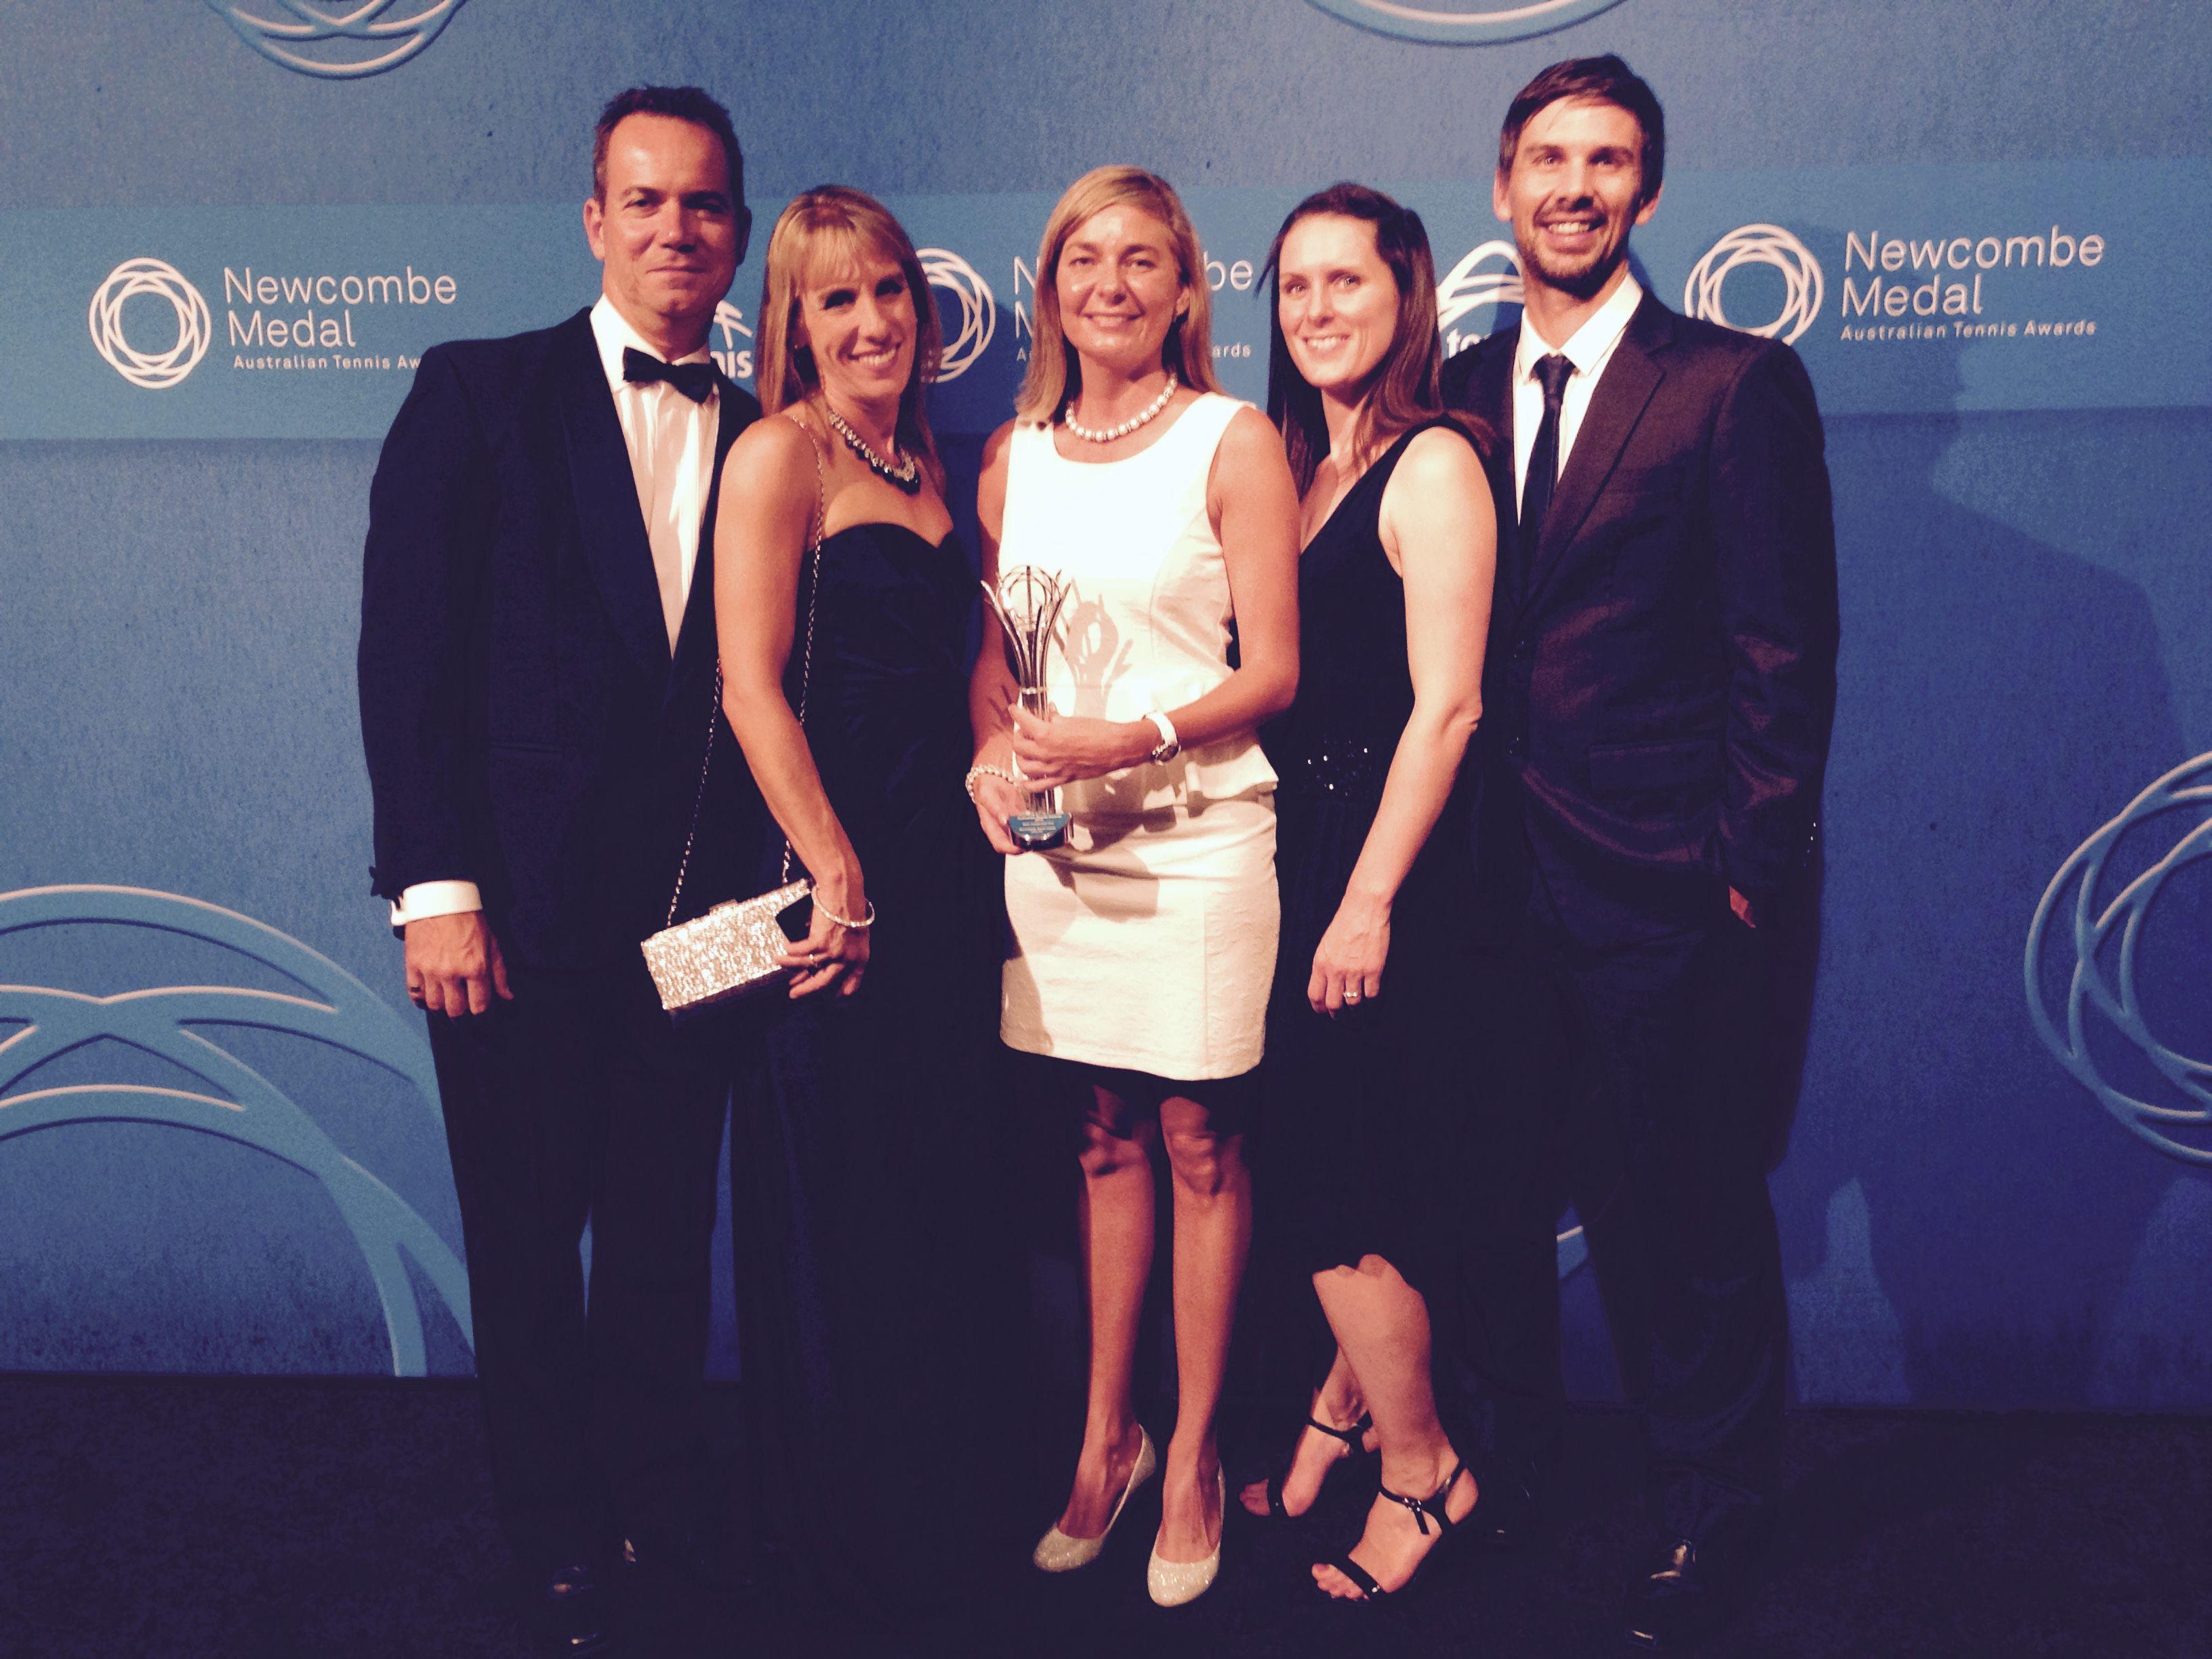 MTC 2014 Australian Tennis Club of the Year